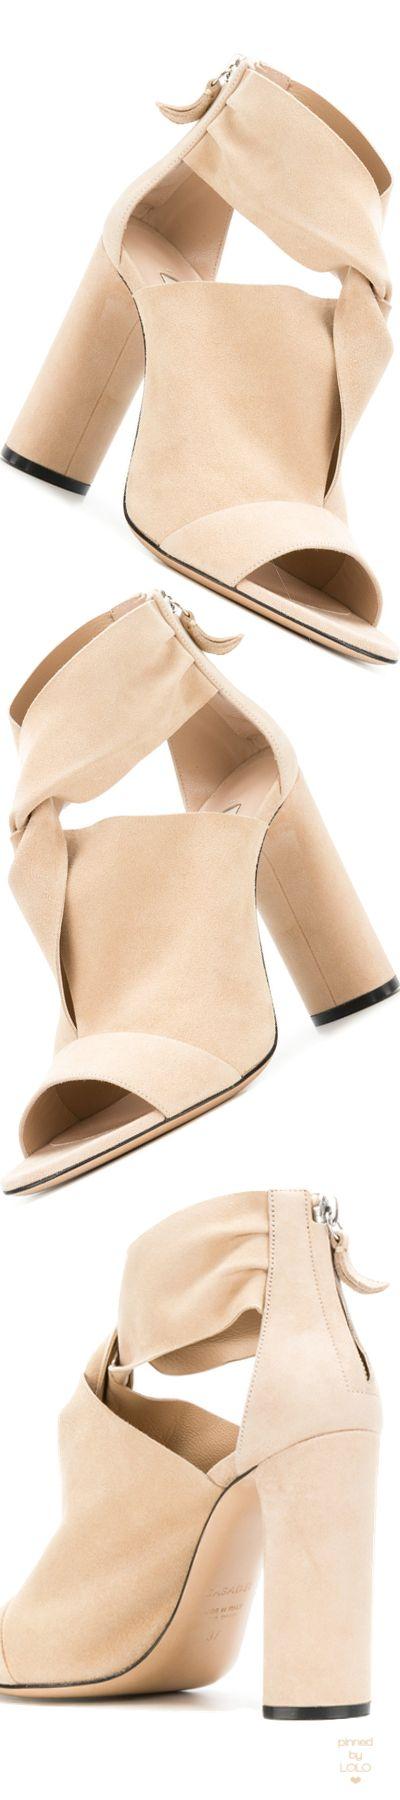 Casadei Crossover Sandals